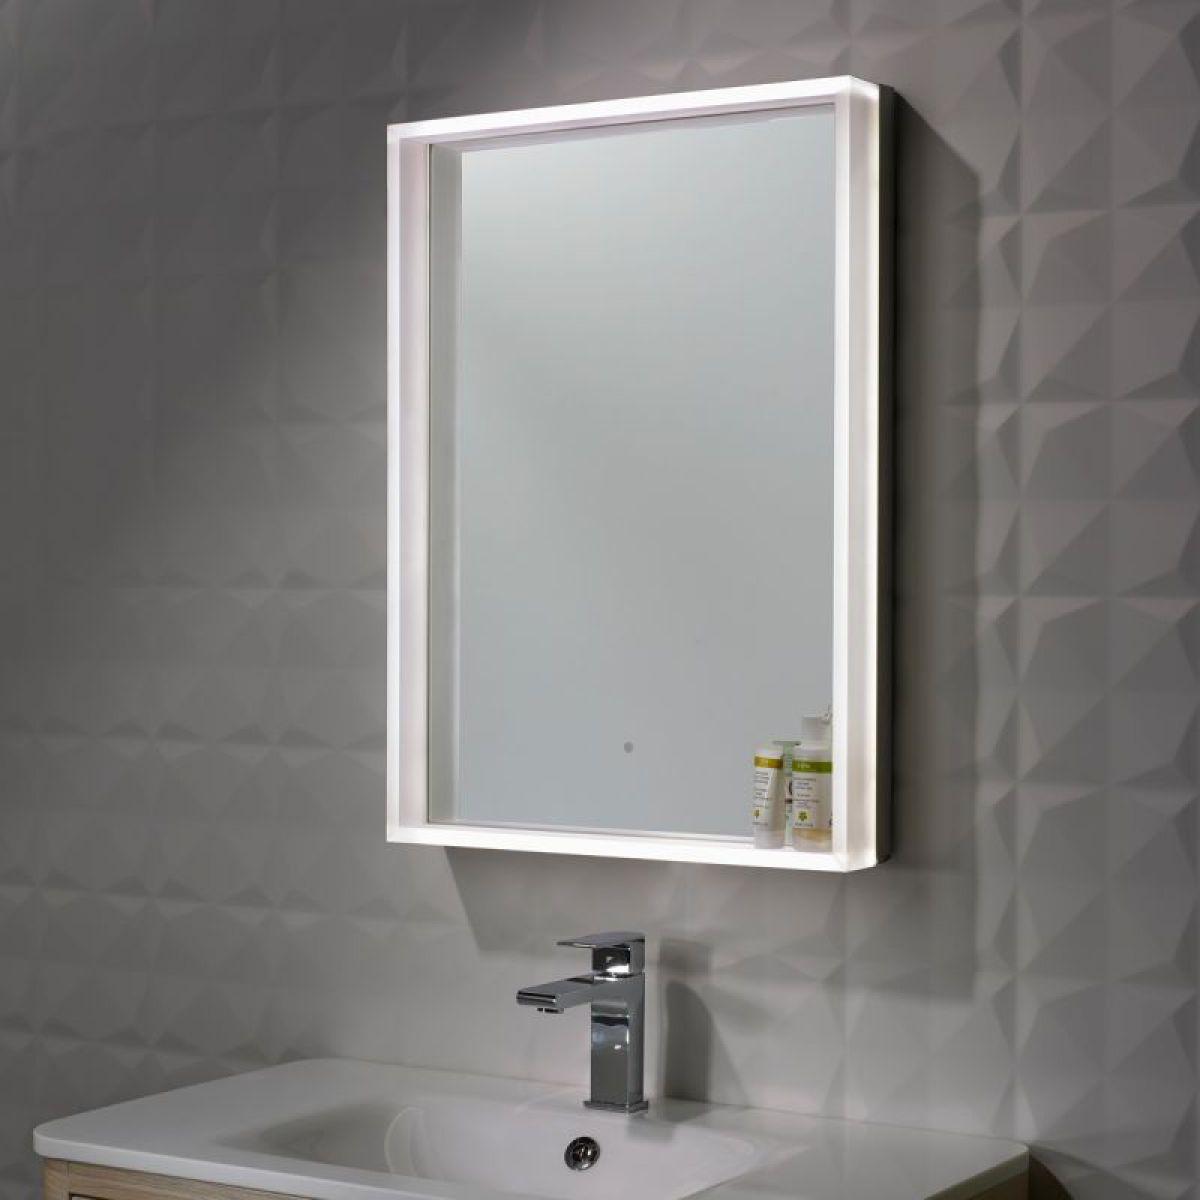 roper rhodes aura illuminated mirror uk bathrooms